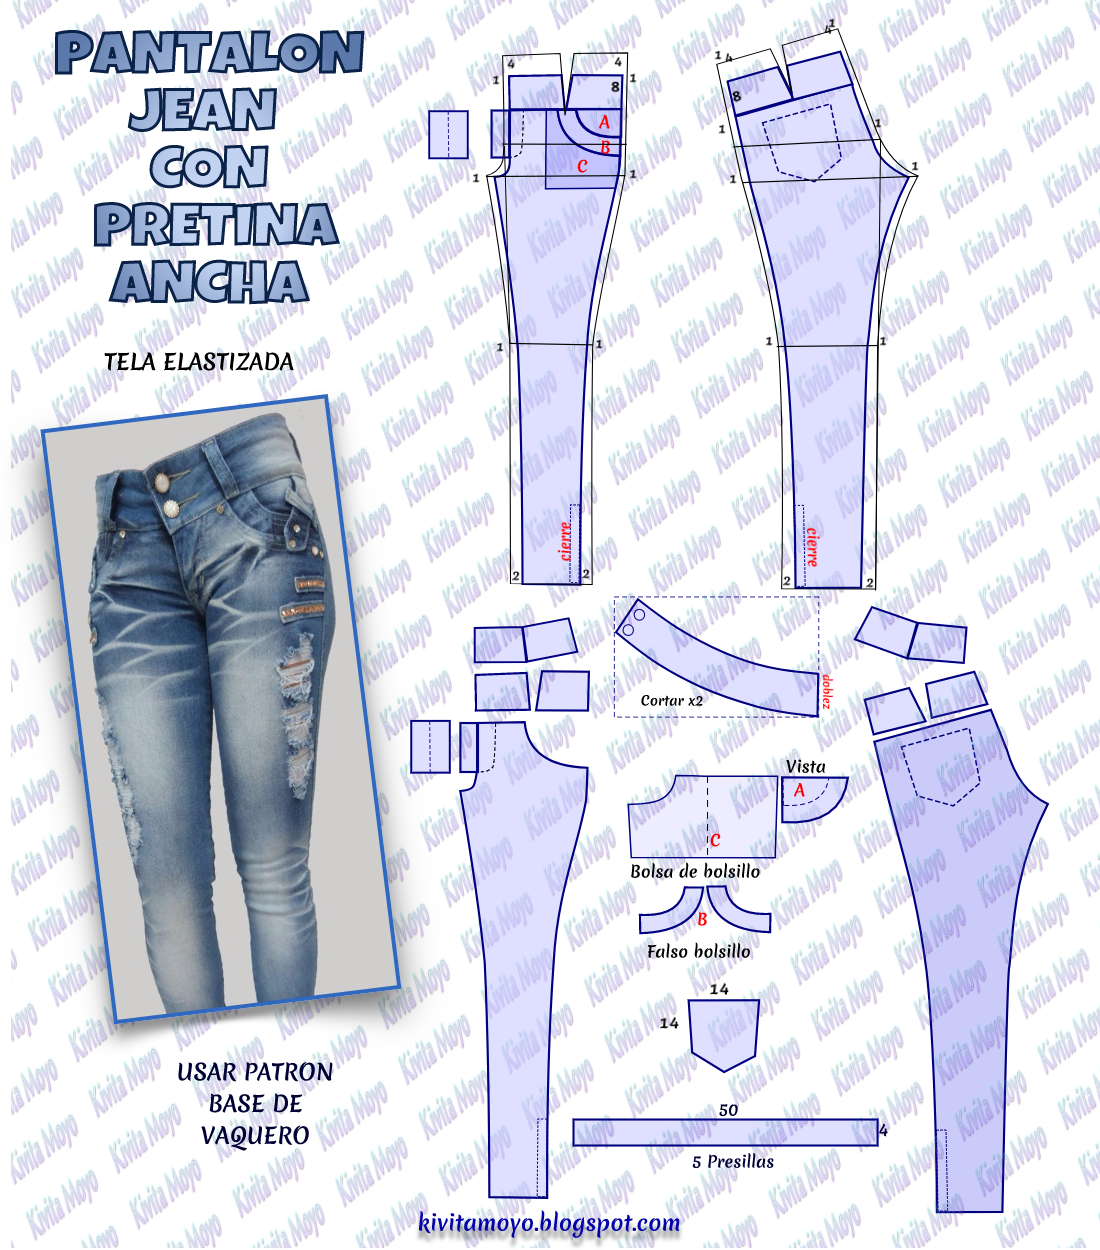 Kivita Moyo Pantalon Vaquero Pretina Ancha Dama Patrón De Pantalones Moldes De Pantalones Pantalones Levanta Cola